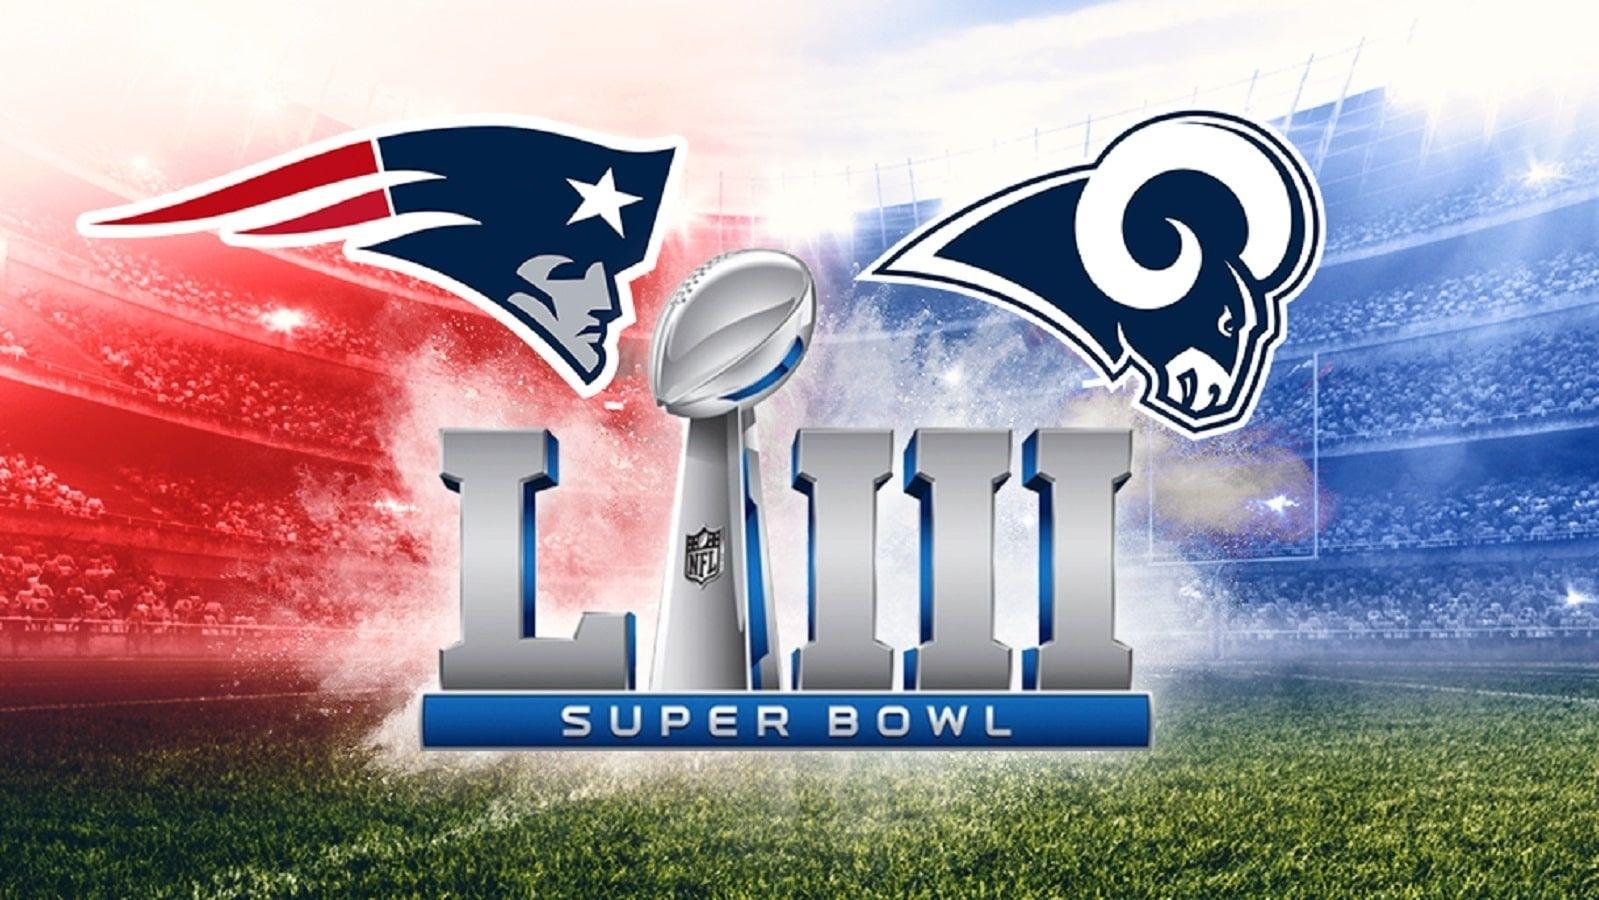 Super Bowl 2019 Logo | Infographics | Super Bowl Props with regard to Super Bowl Sunday 2019